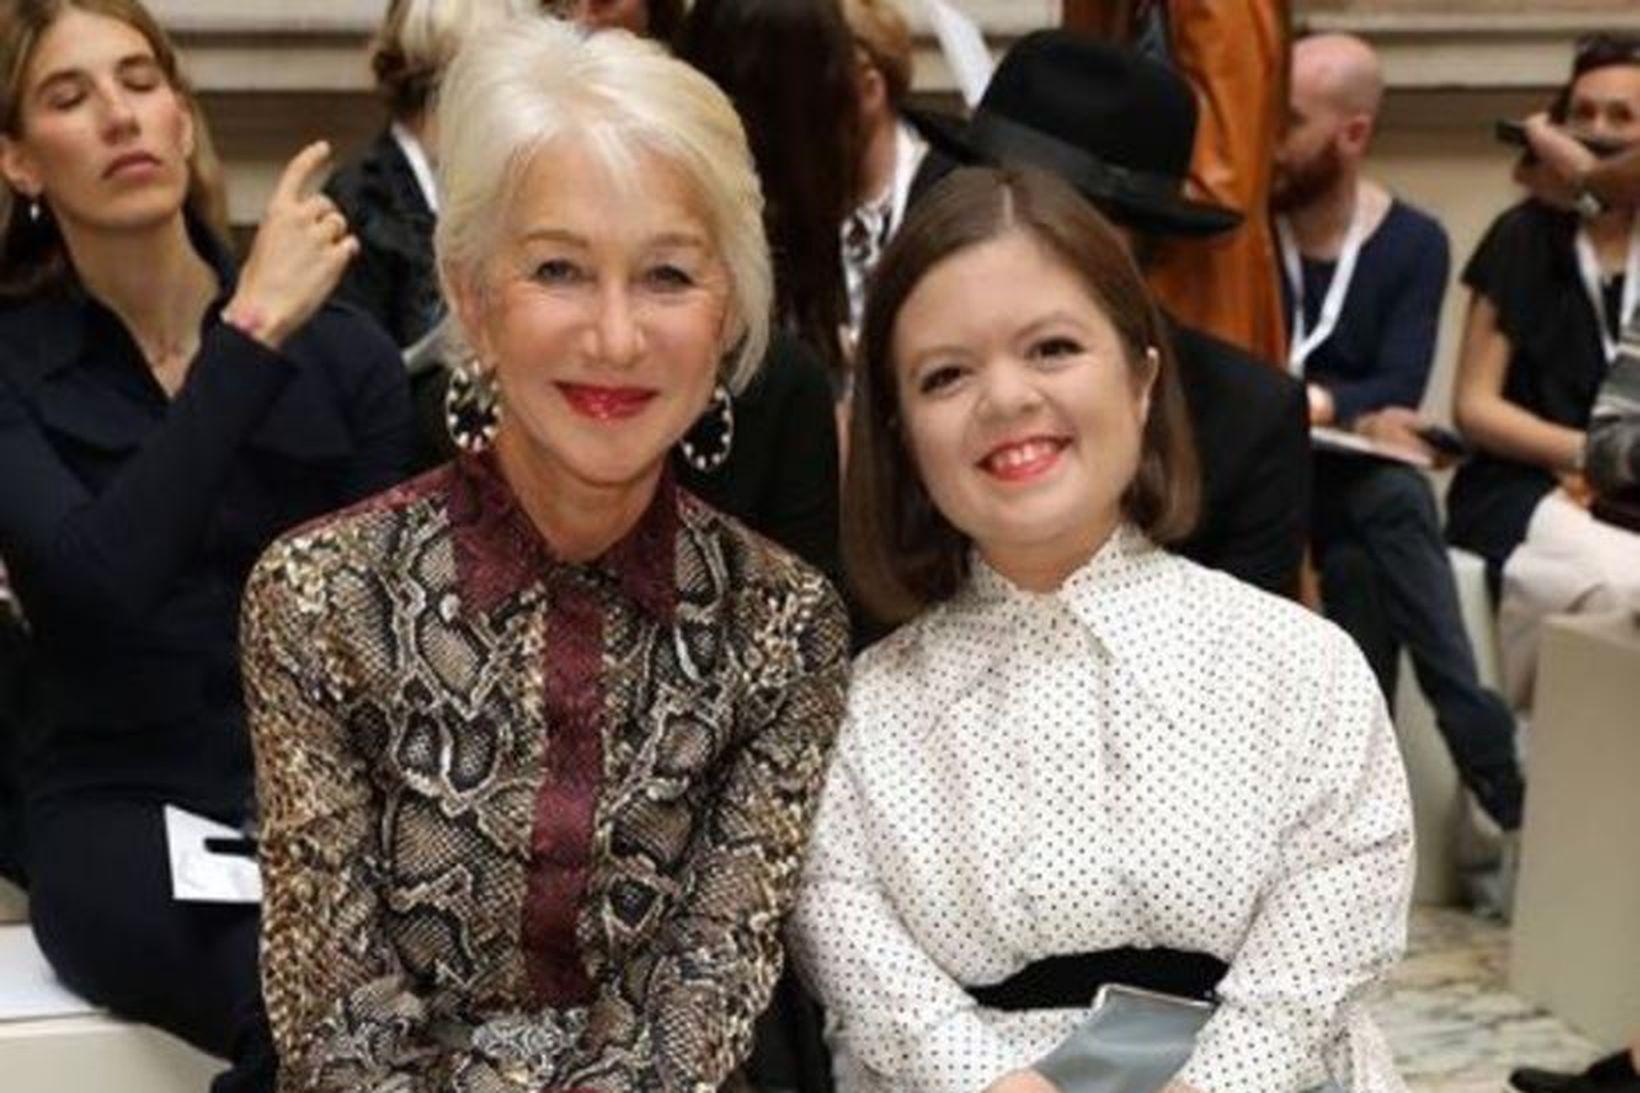 Victoria Beckham birti mynd af Helen Mirren og Sinéad Burke …